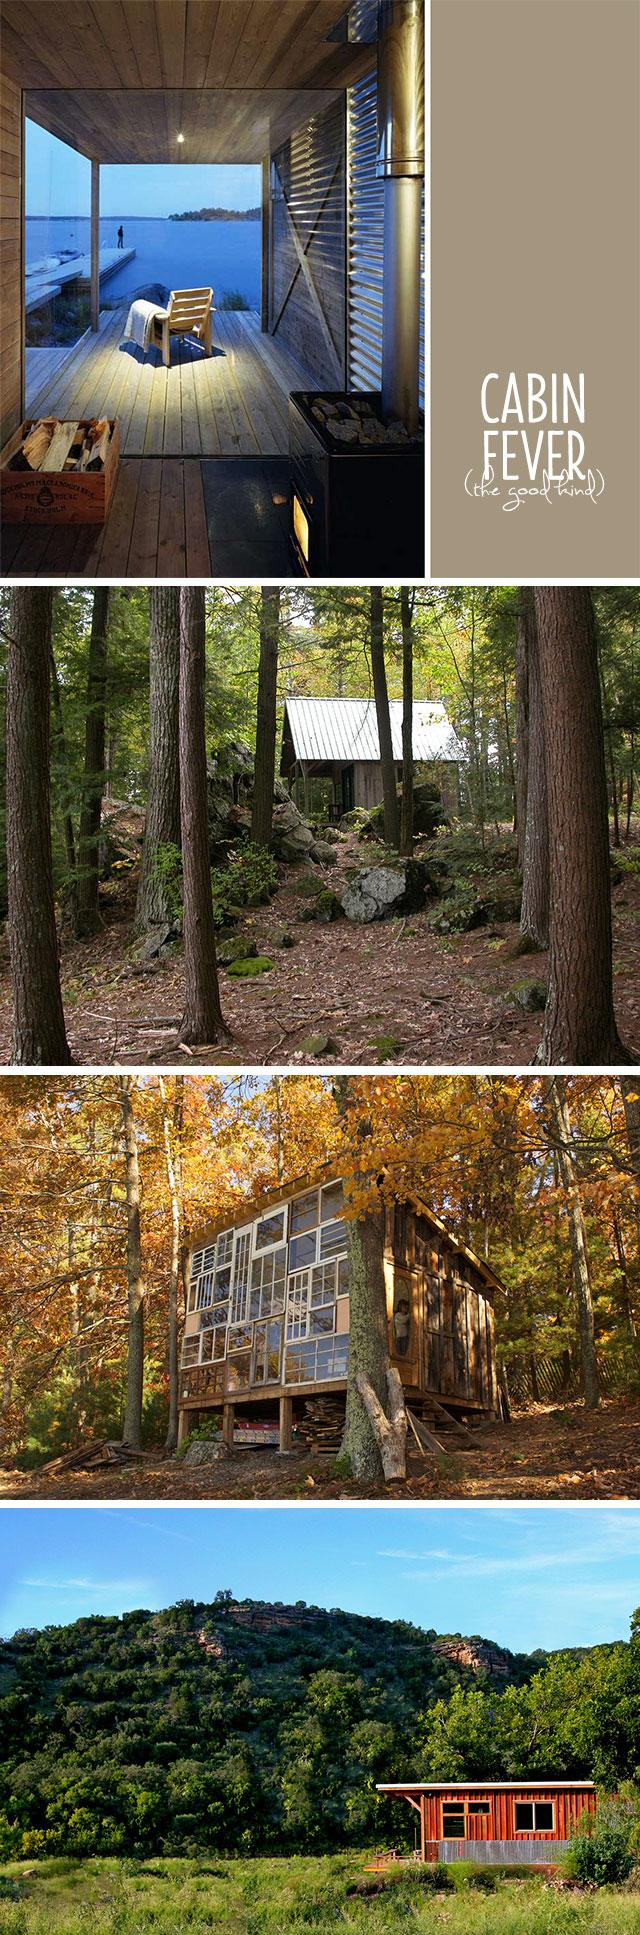 cabin getaways - bunnyanddolly.com